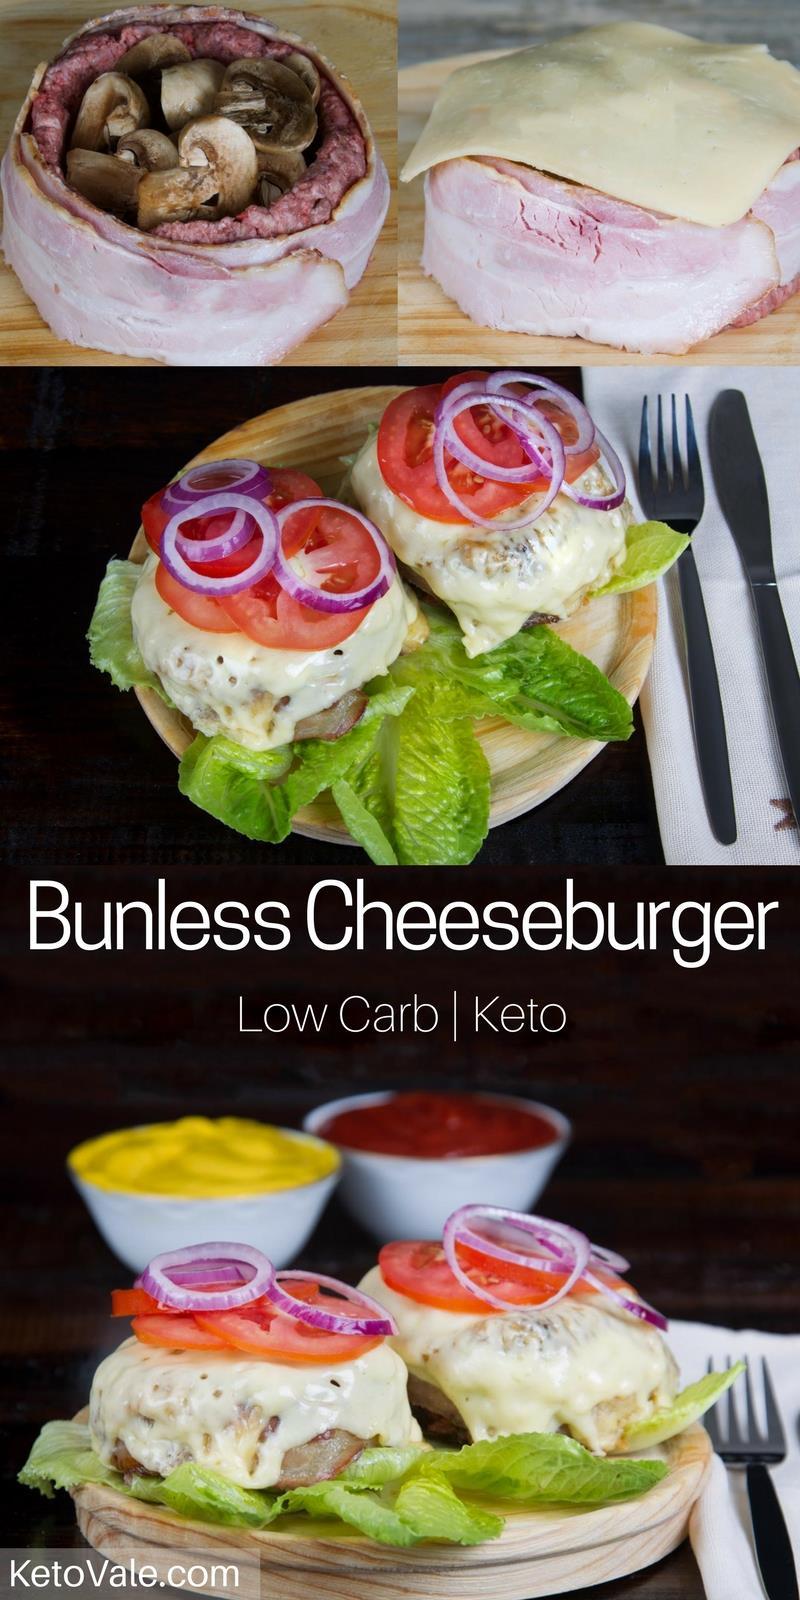 Bunless Cheeseburger